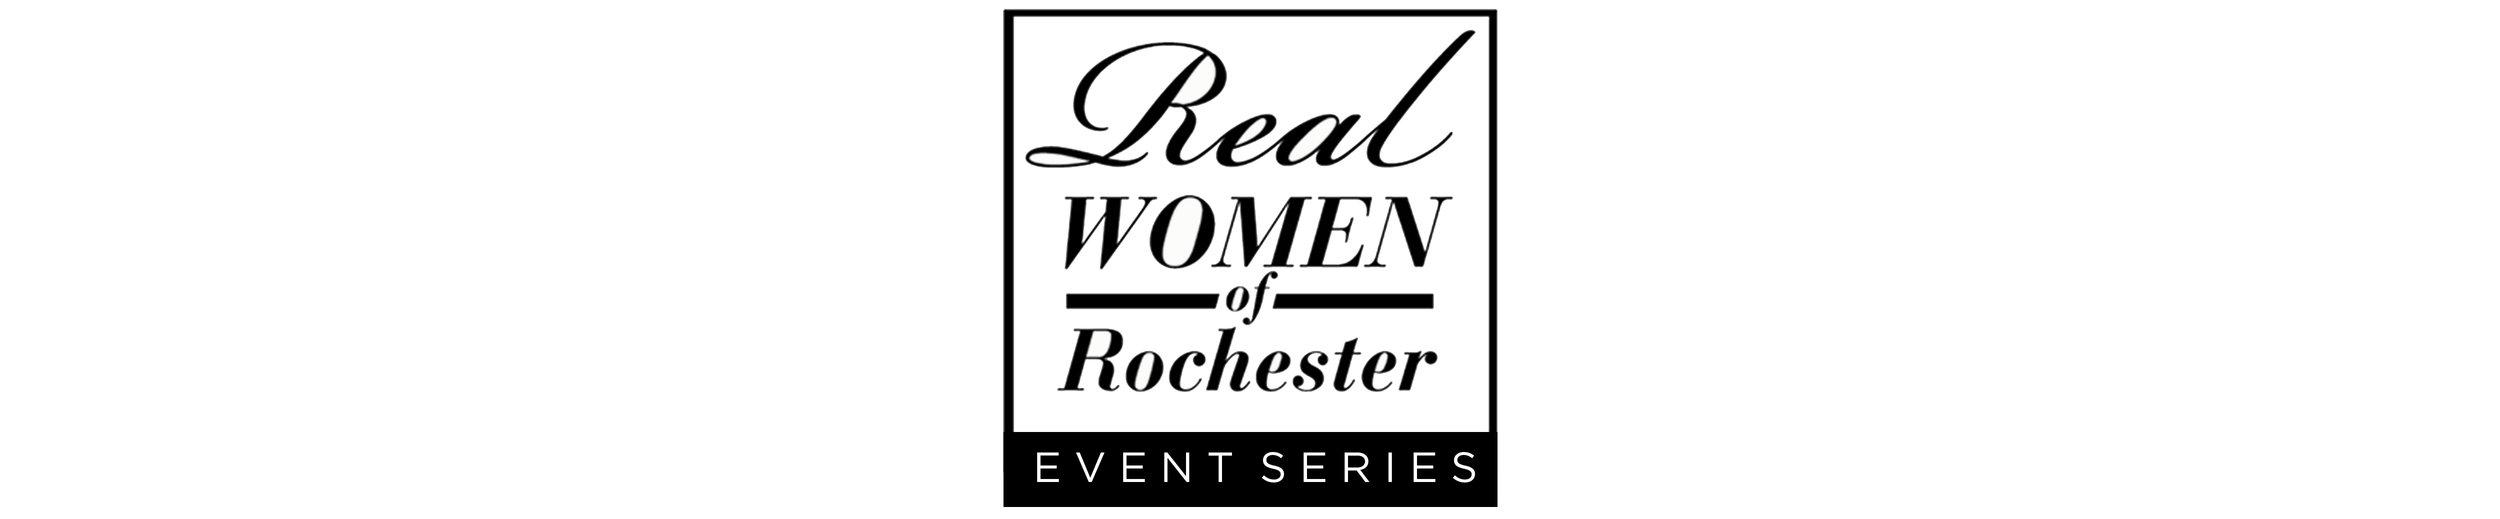 rwor-EVENTS-banner.jpg